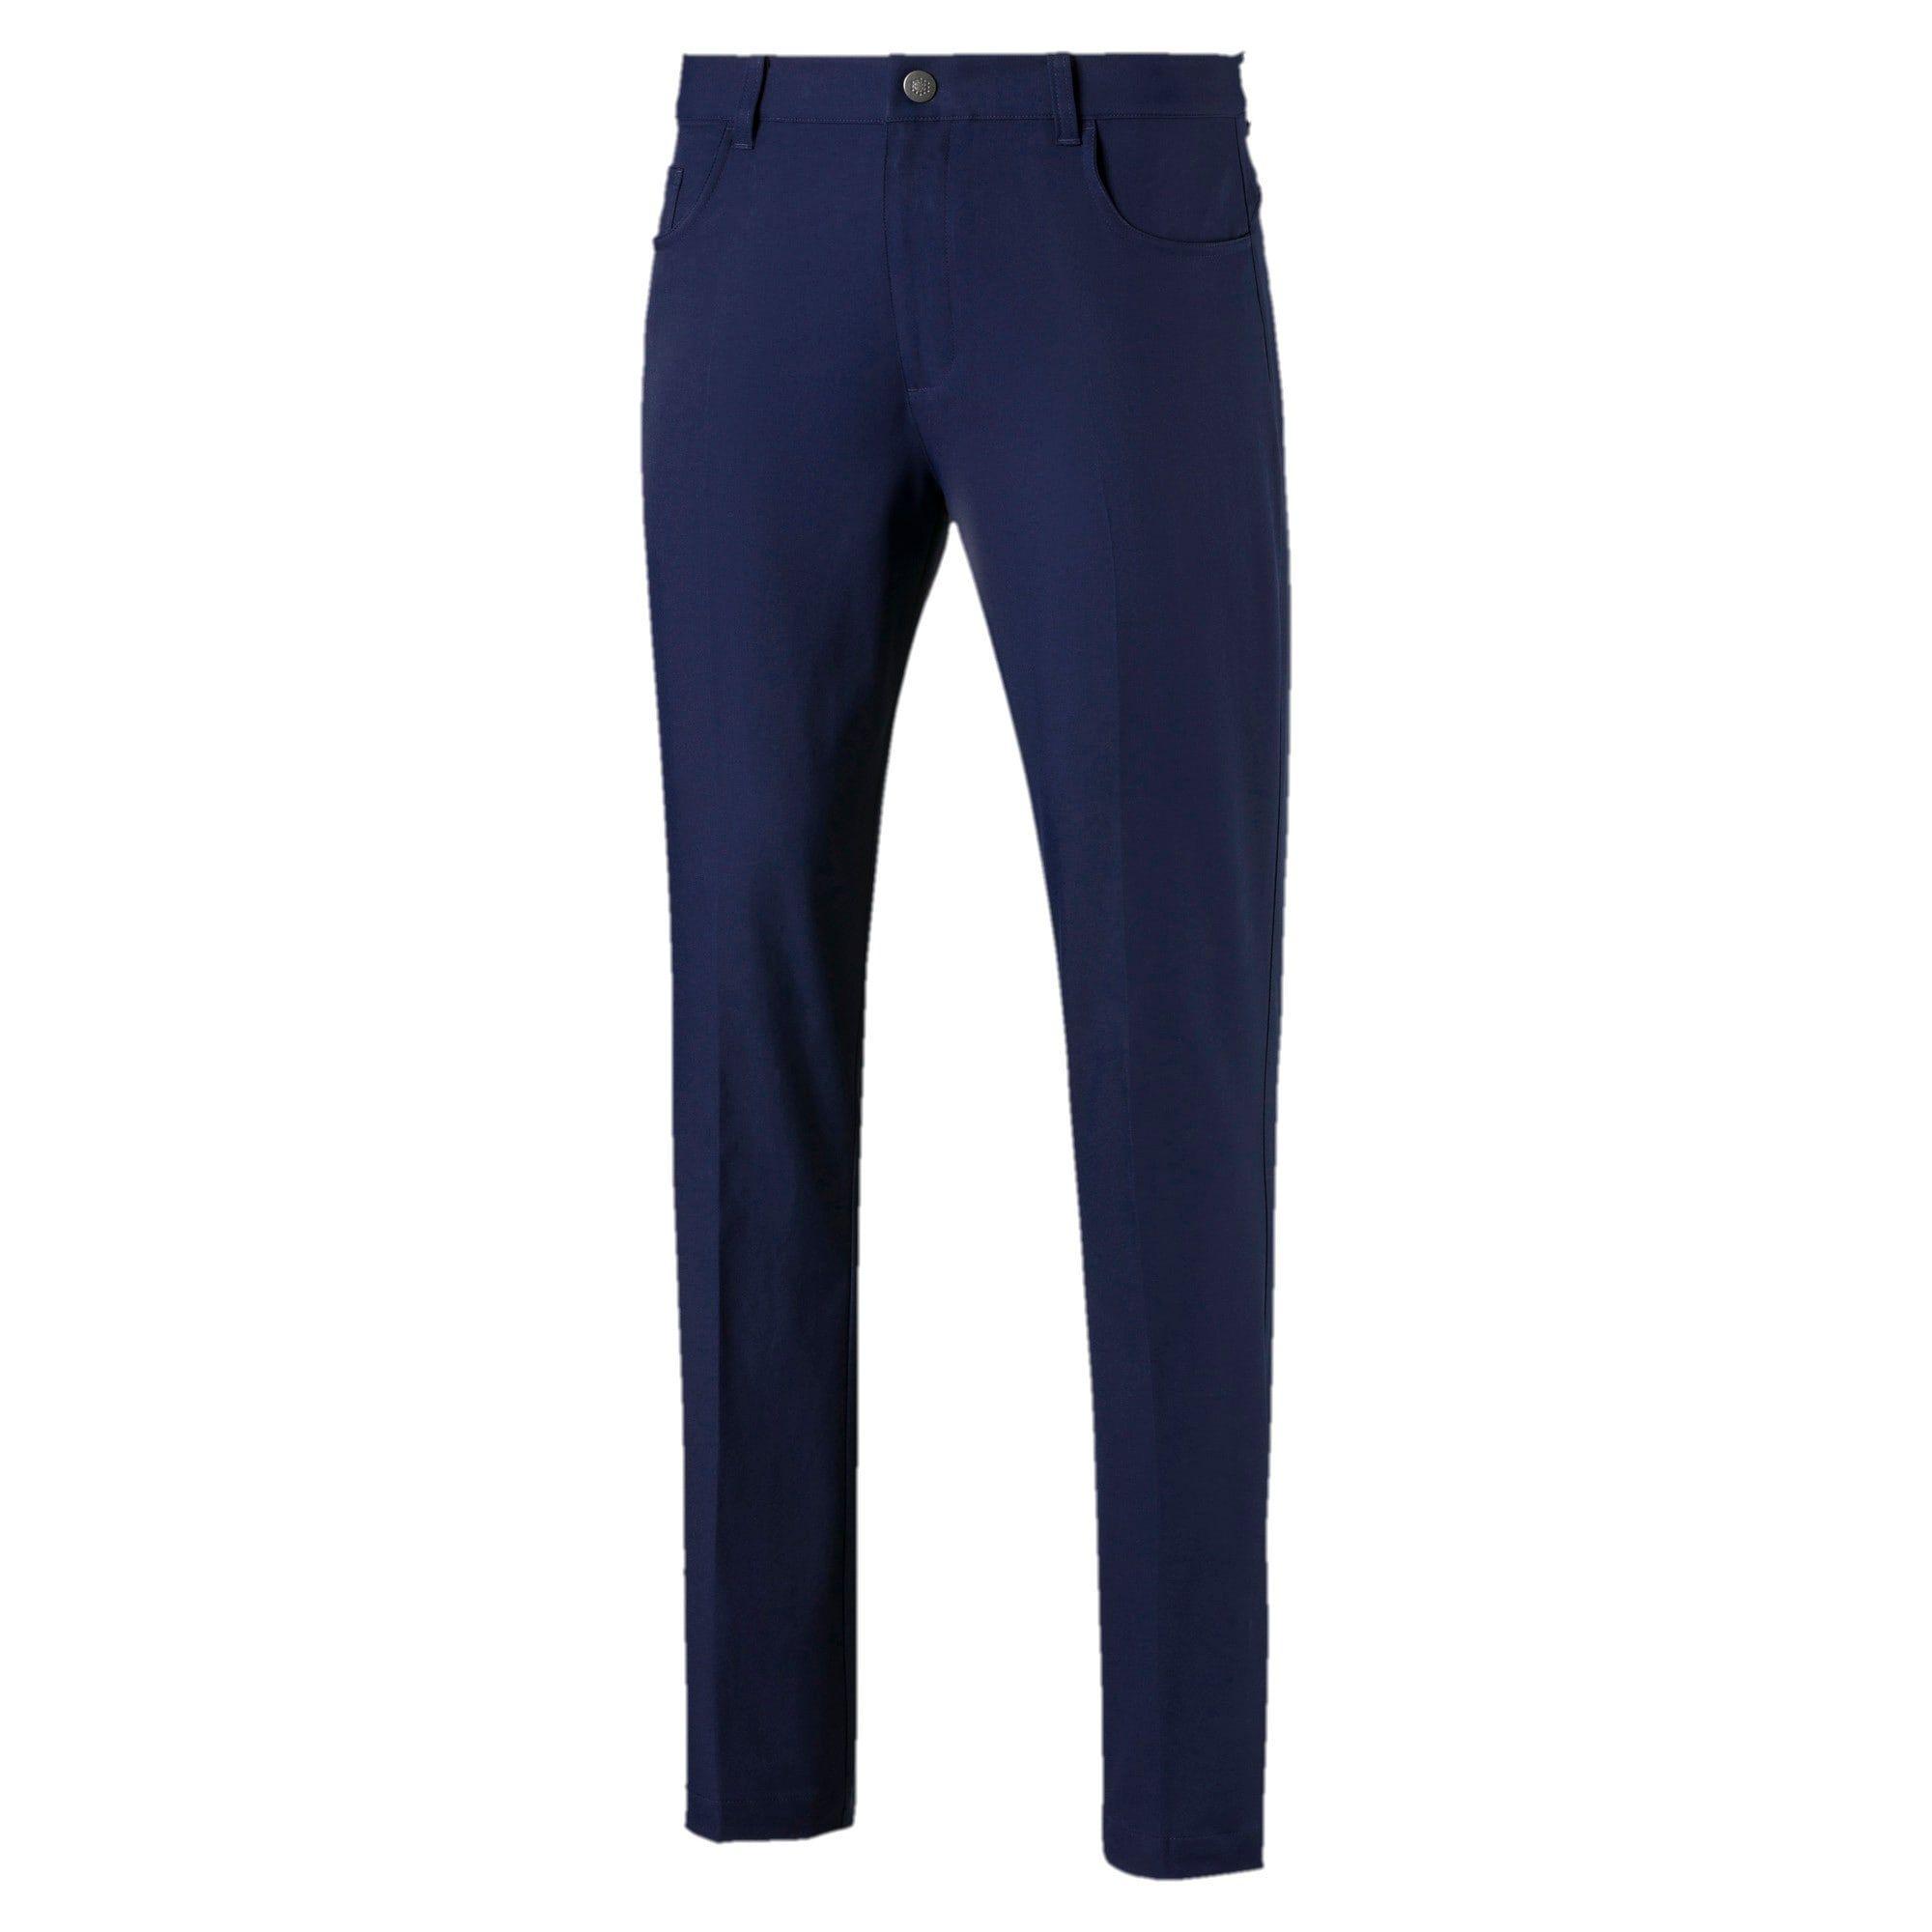 PUMA Jackpot Woven 5 Pocket Men's Golf Pants, Peacoat, size 30/32, Clothing